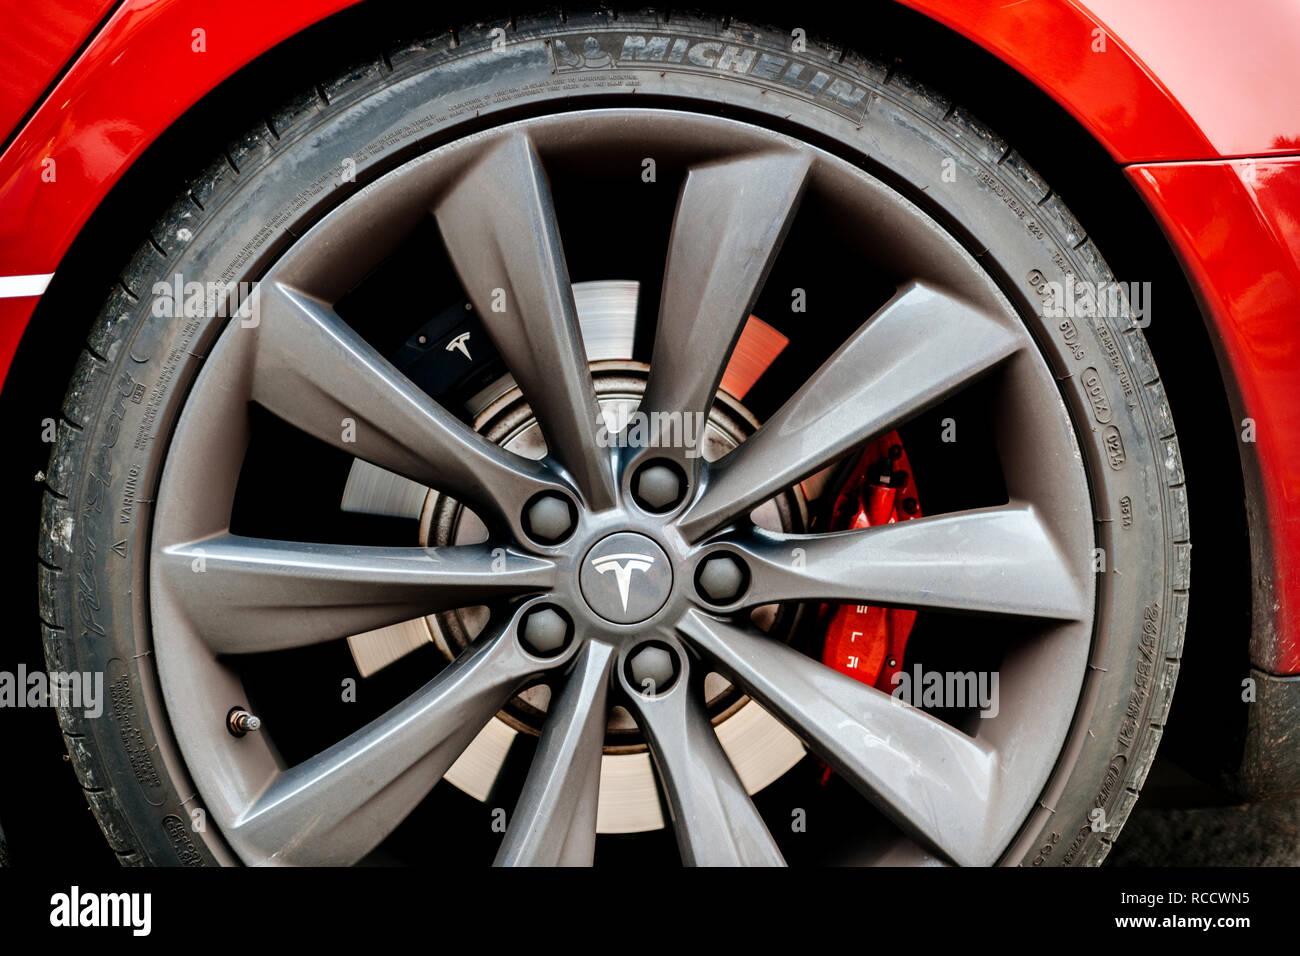 PARIS, FRANCE - NOV 29, 2014: Close-up of aluminium rim of luxury electric red Tesla Model S car wheel with distinct logotype insignia parked on street - Stock Image